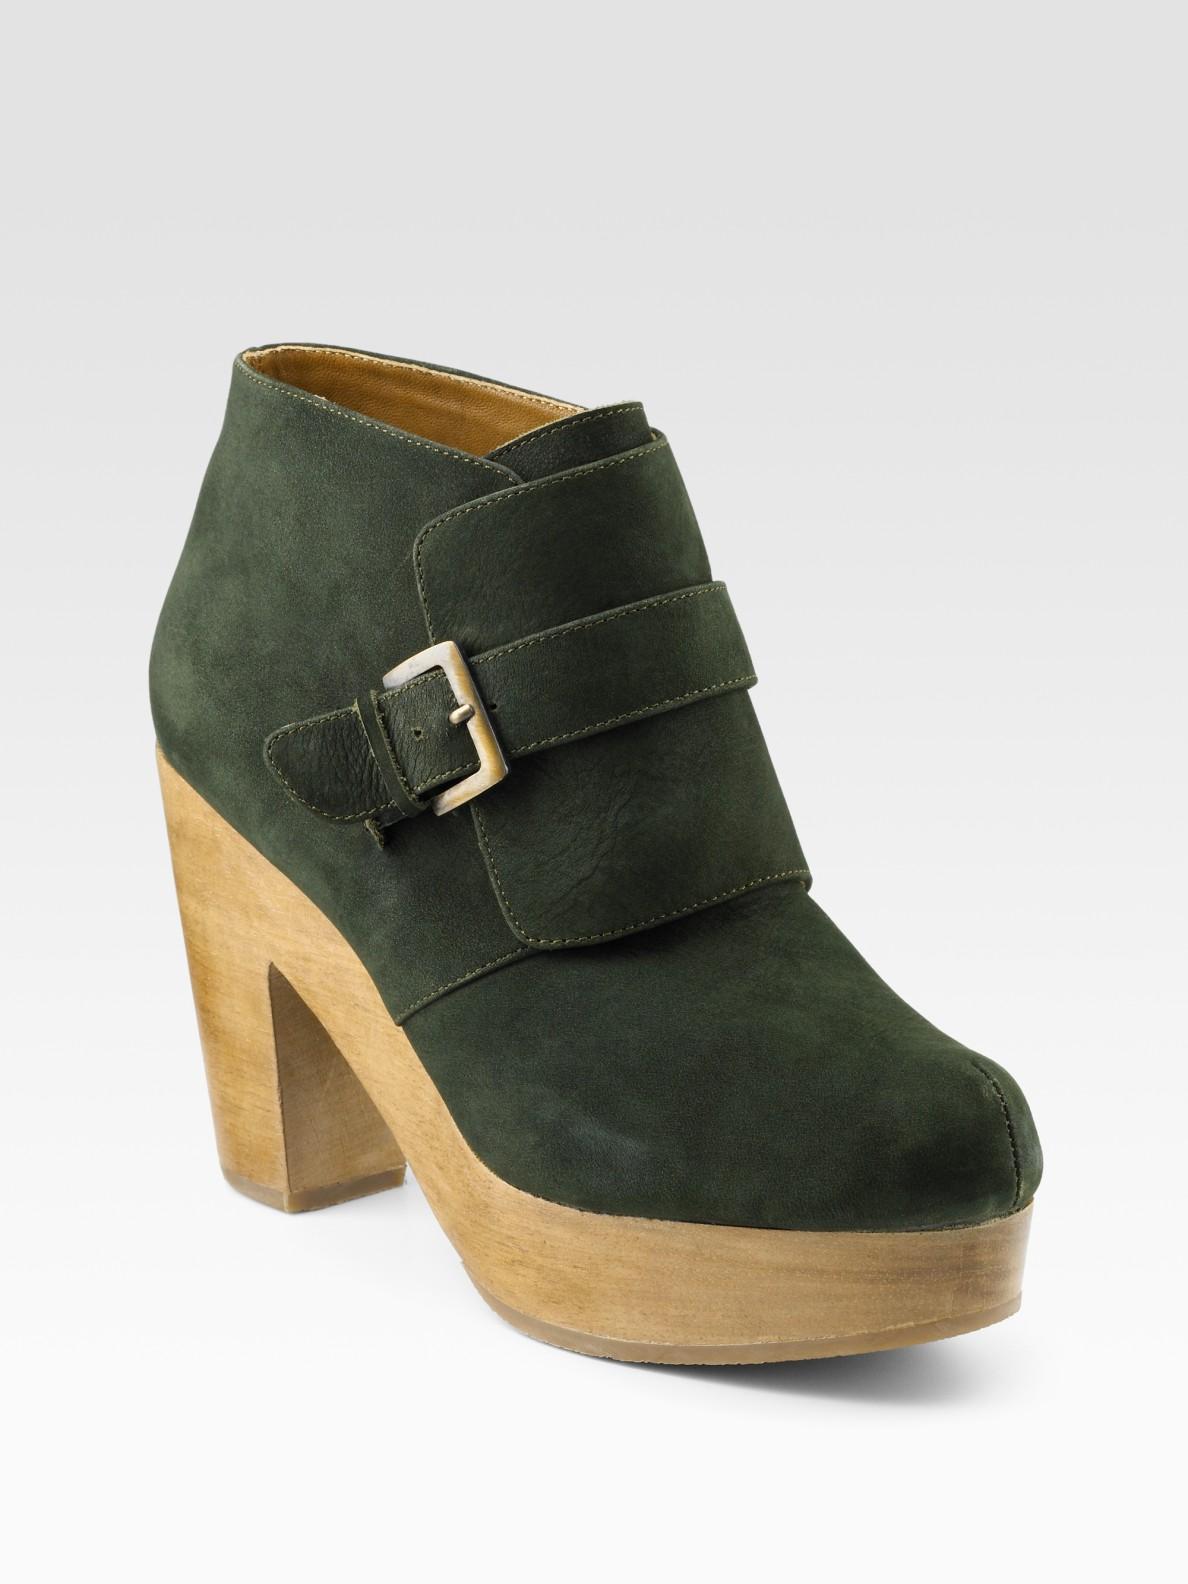 Lyst Rachel Comey Bernard Clog Bottom Suede Ankle Boots